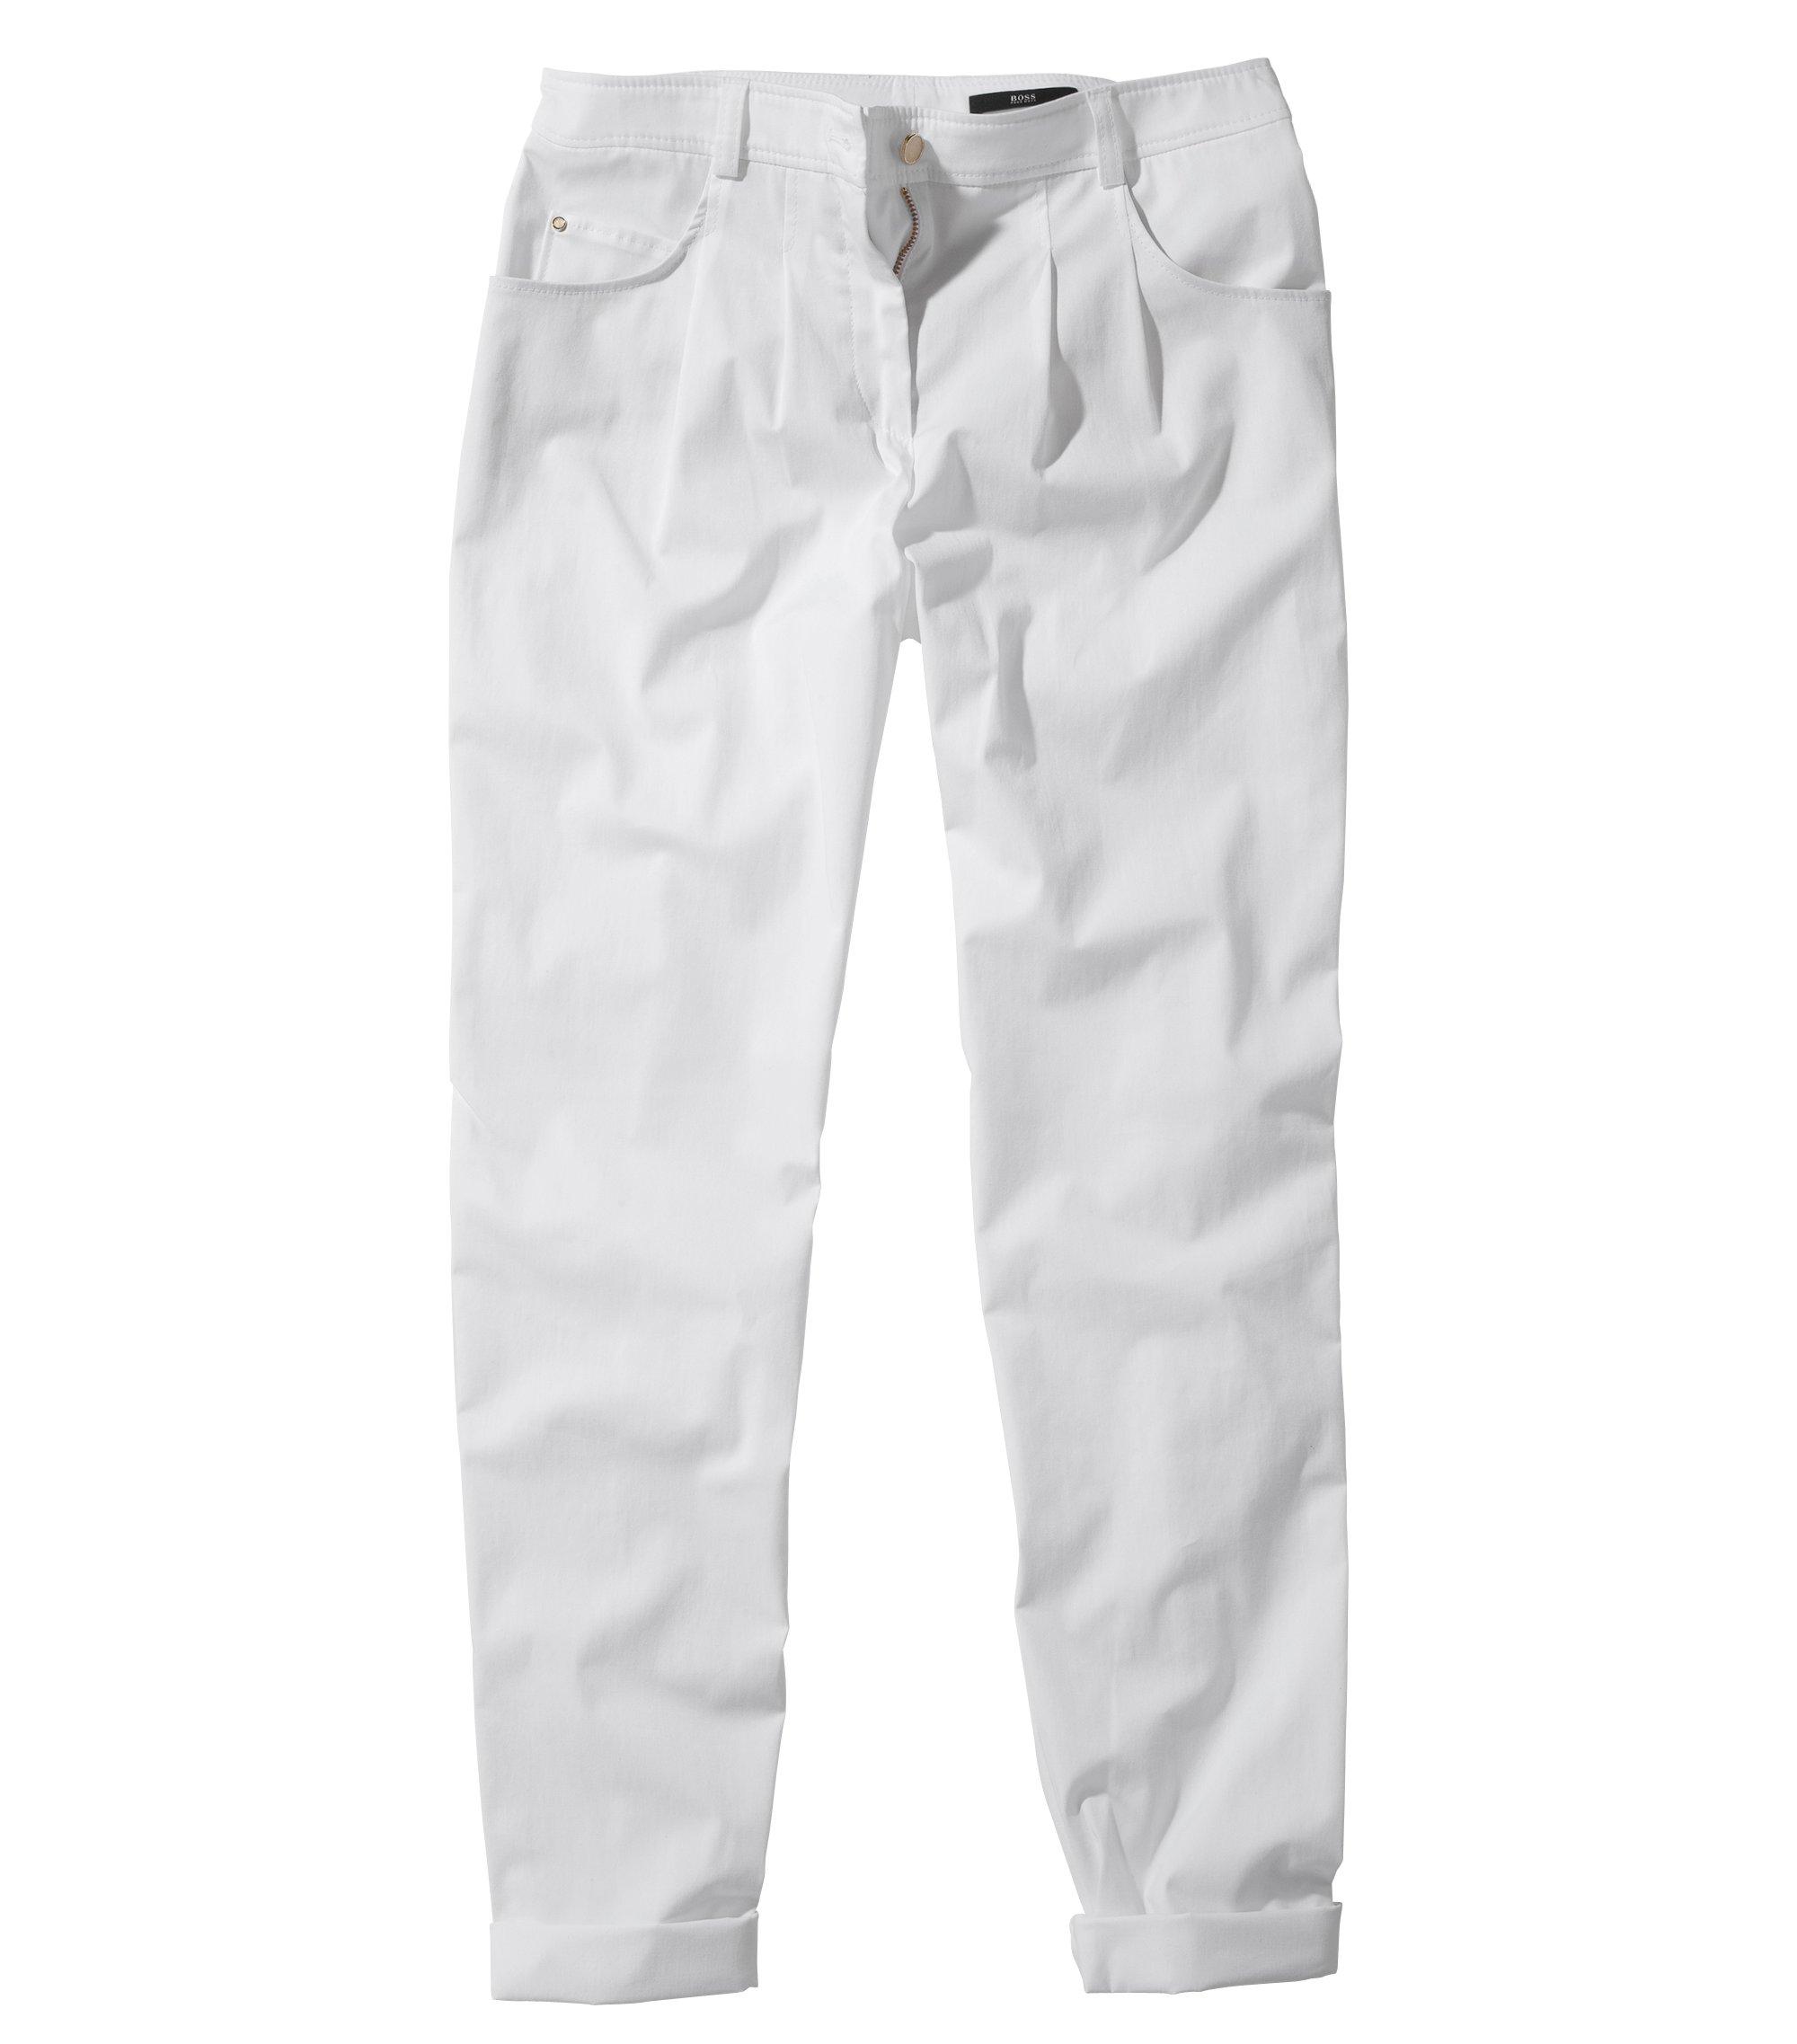 Pantalon chino à pinces, Nastija, Blanc